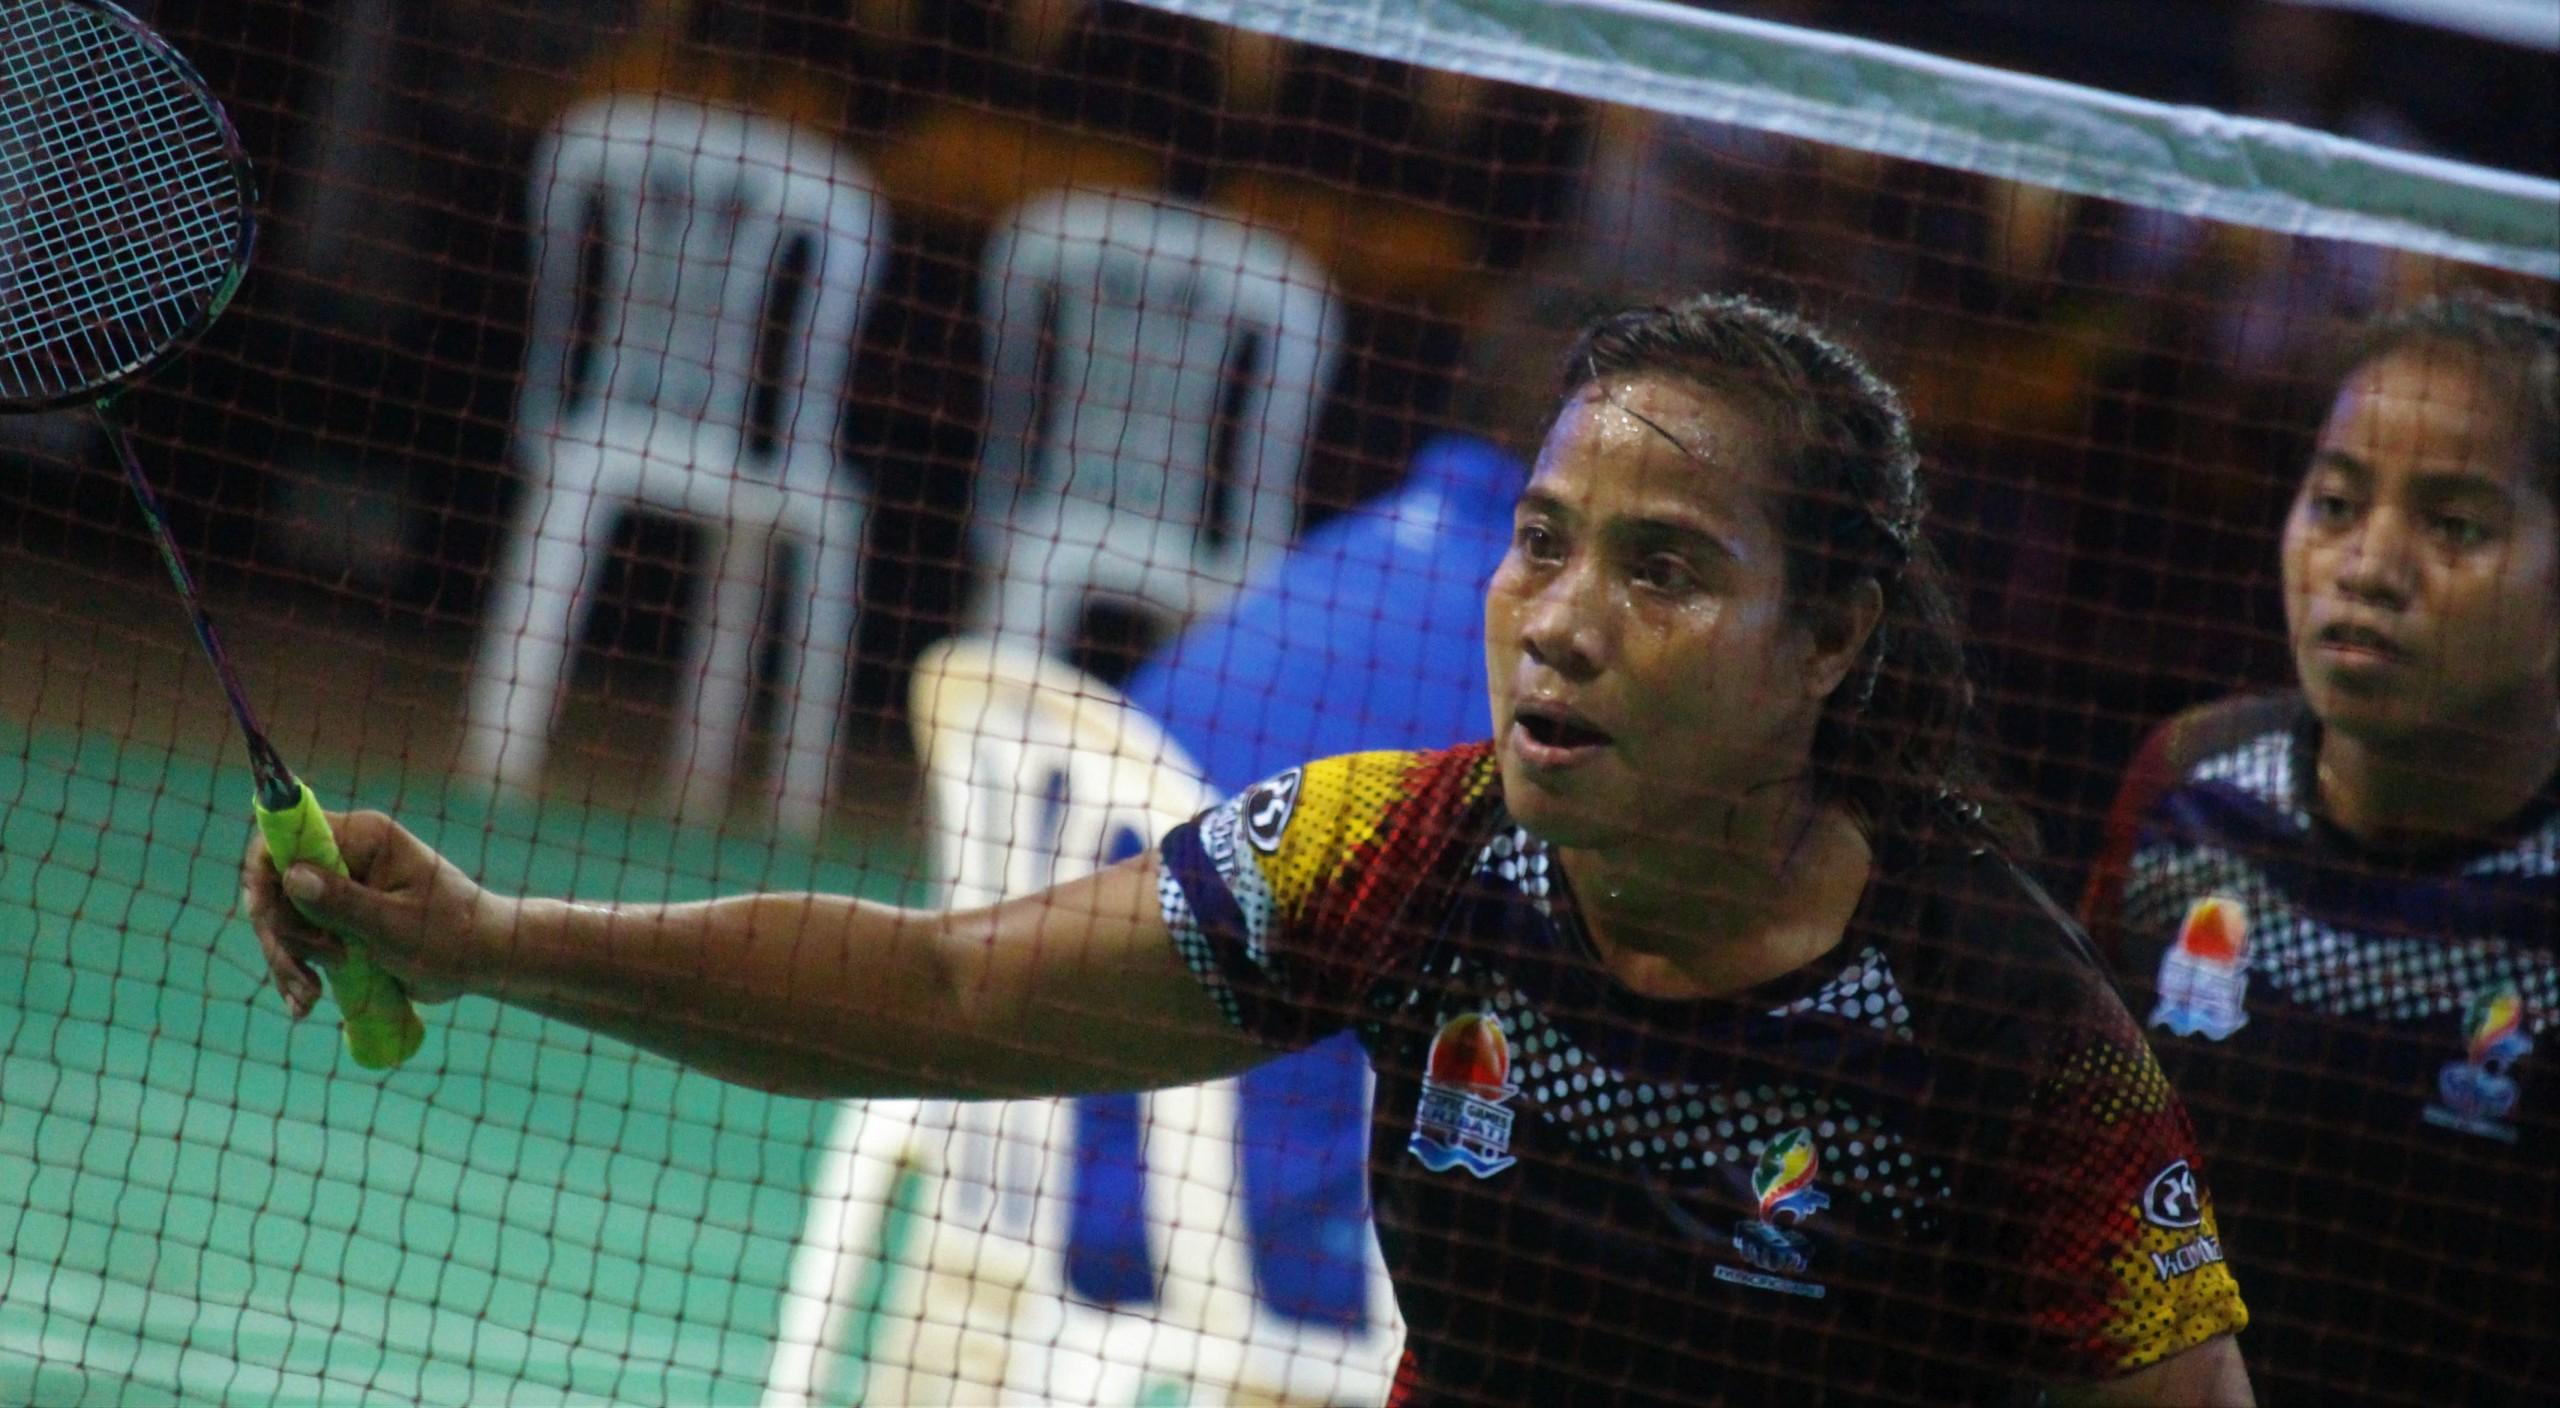 Teitiria and Tinabora – Kiribati's Perfect Badminton Role Models